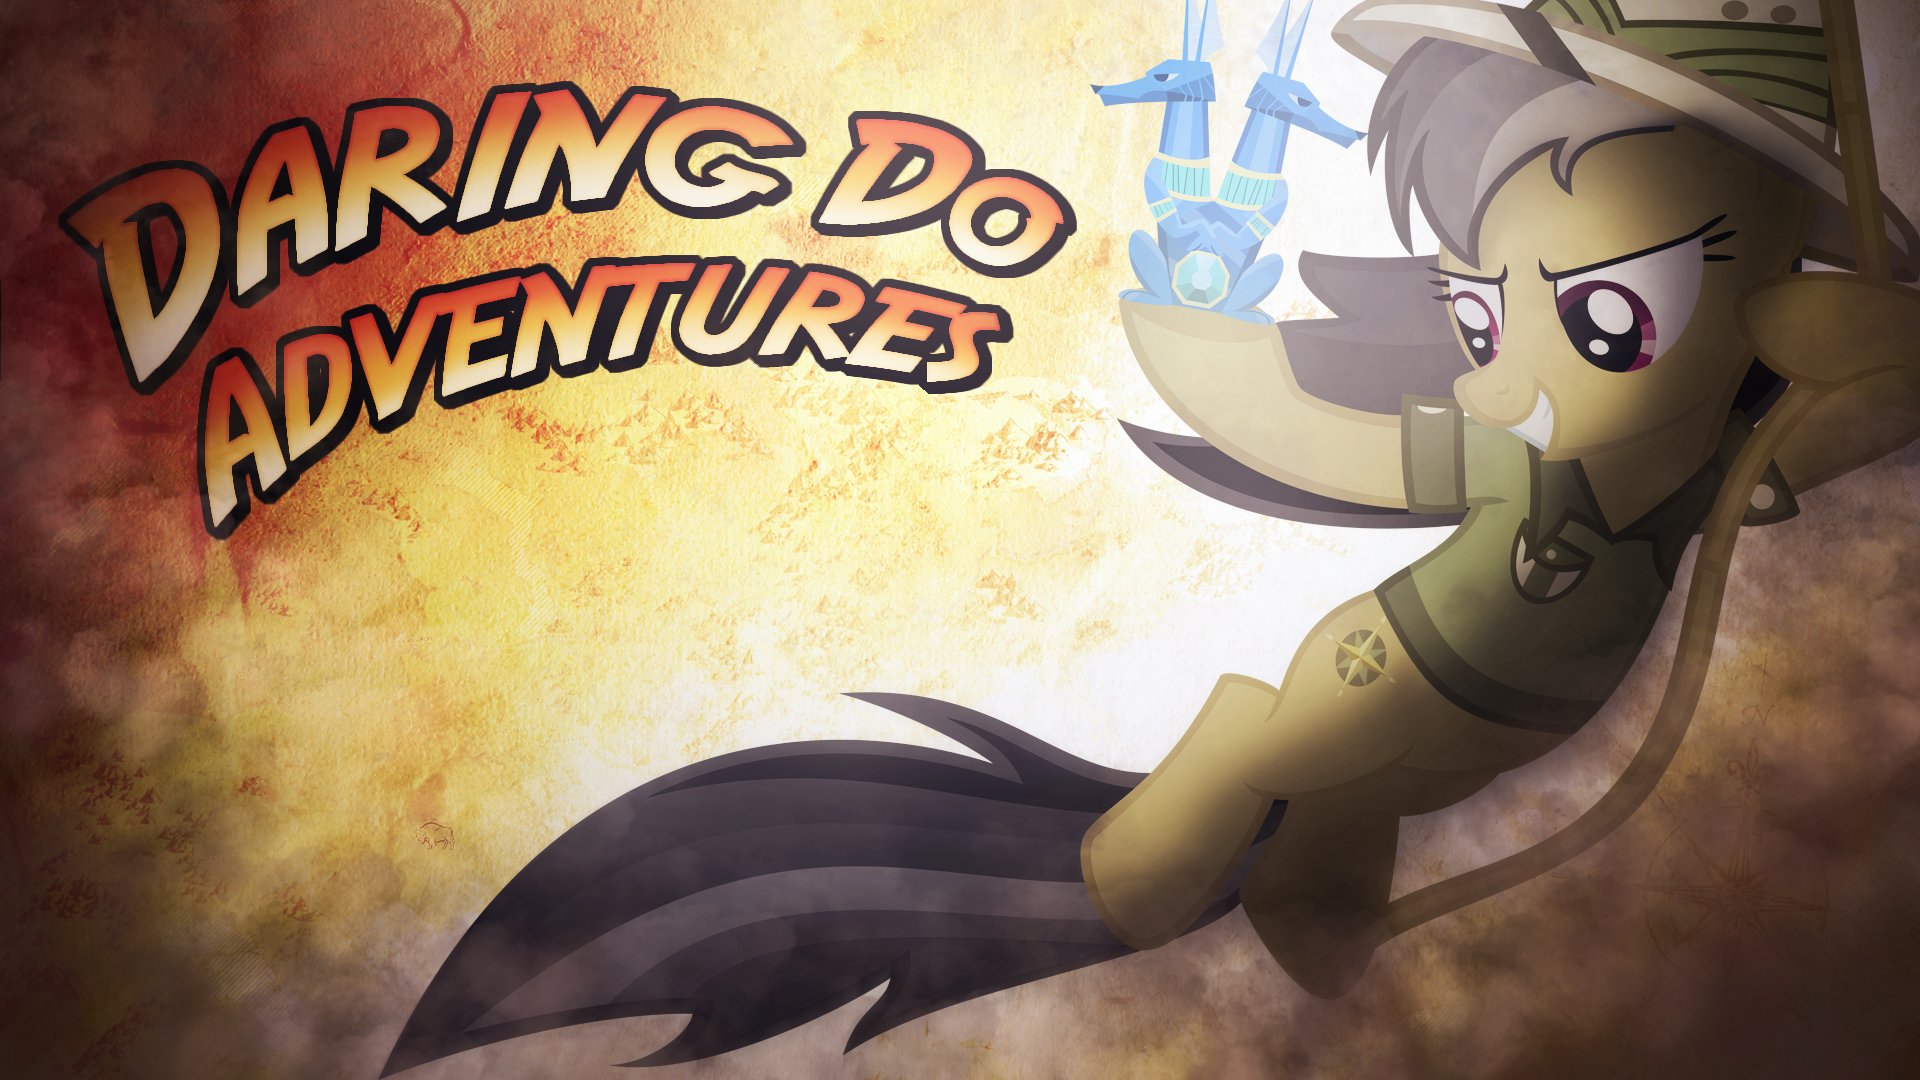 Daring Do Adventures!